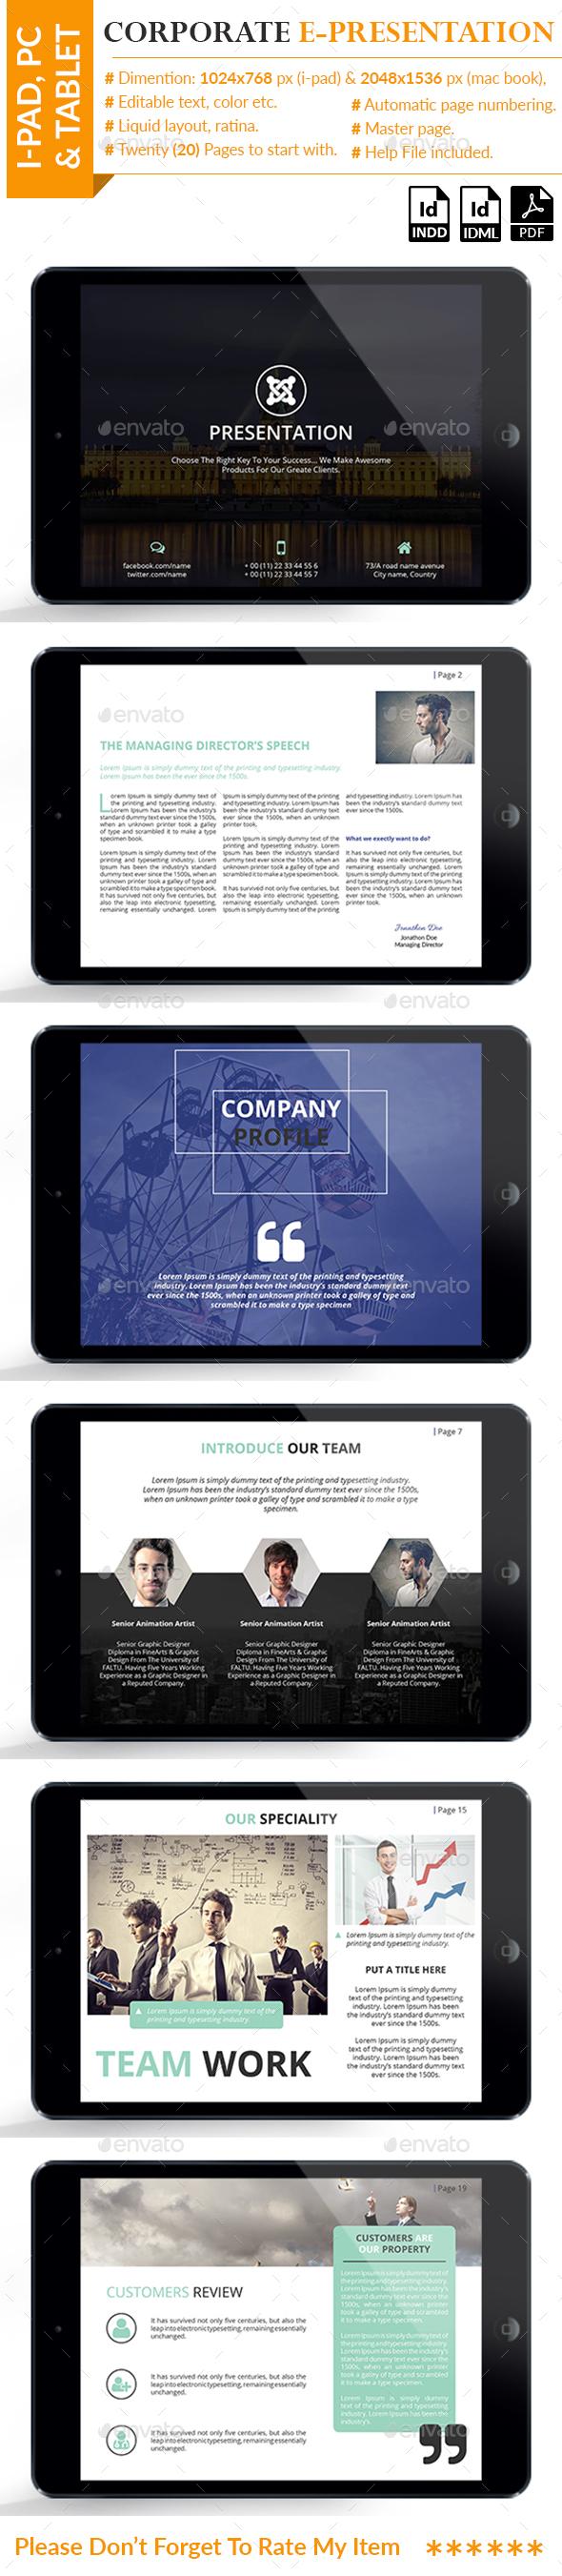 Corporate E-Presentation - Digital Books ePublishing